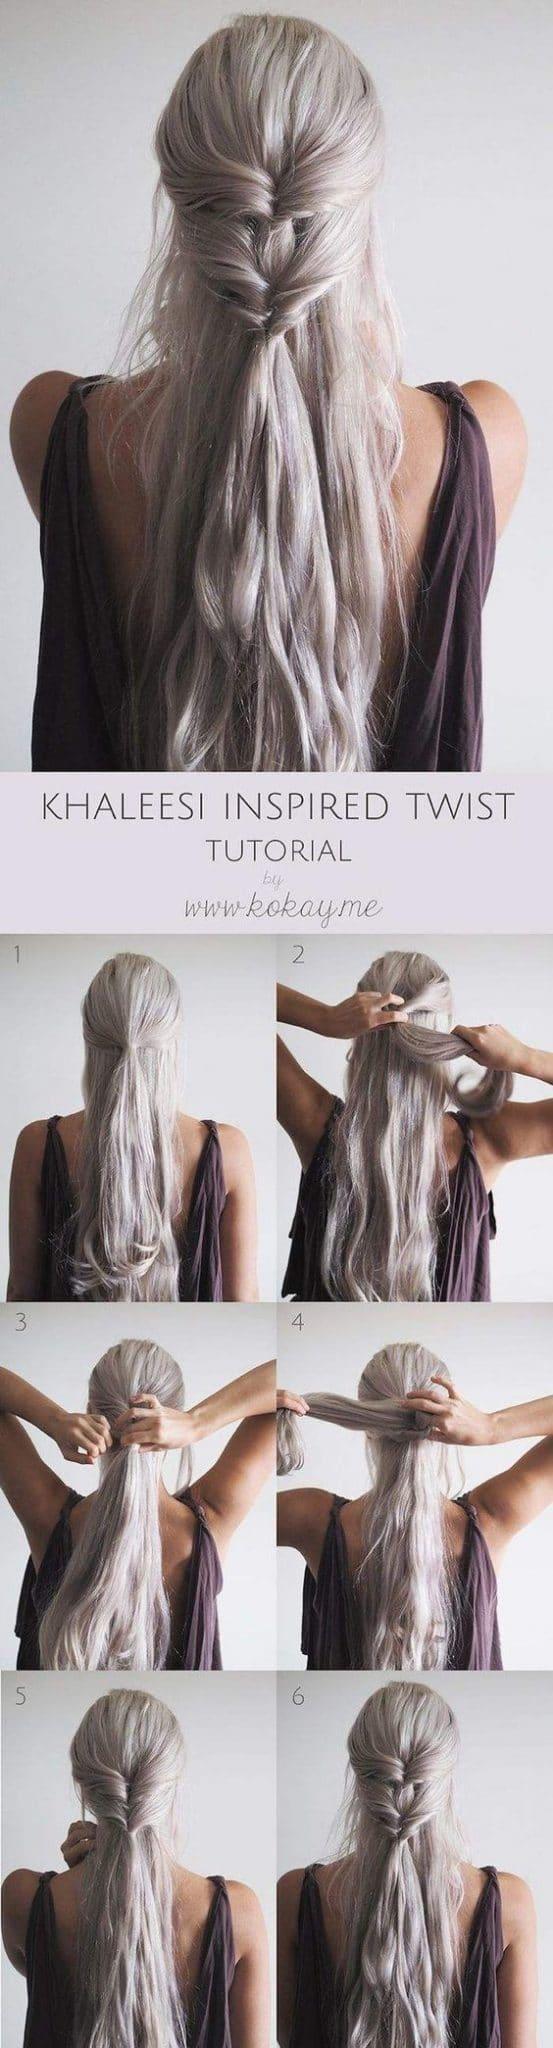 Khaleesi Inspired Twist